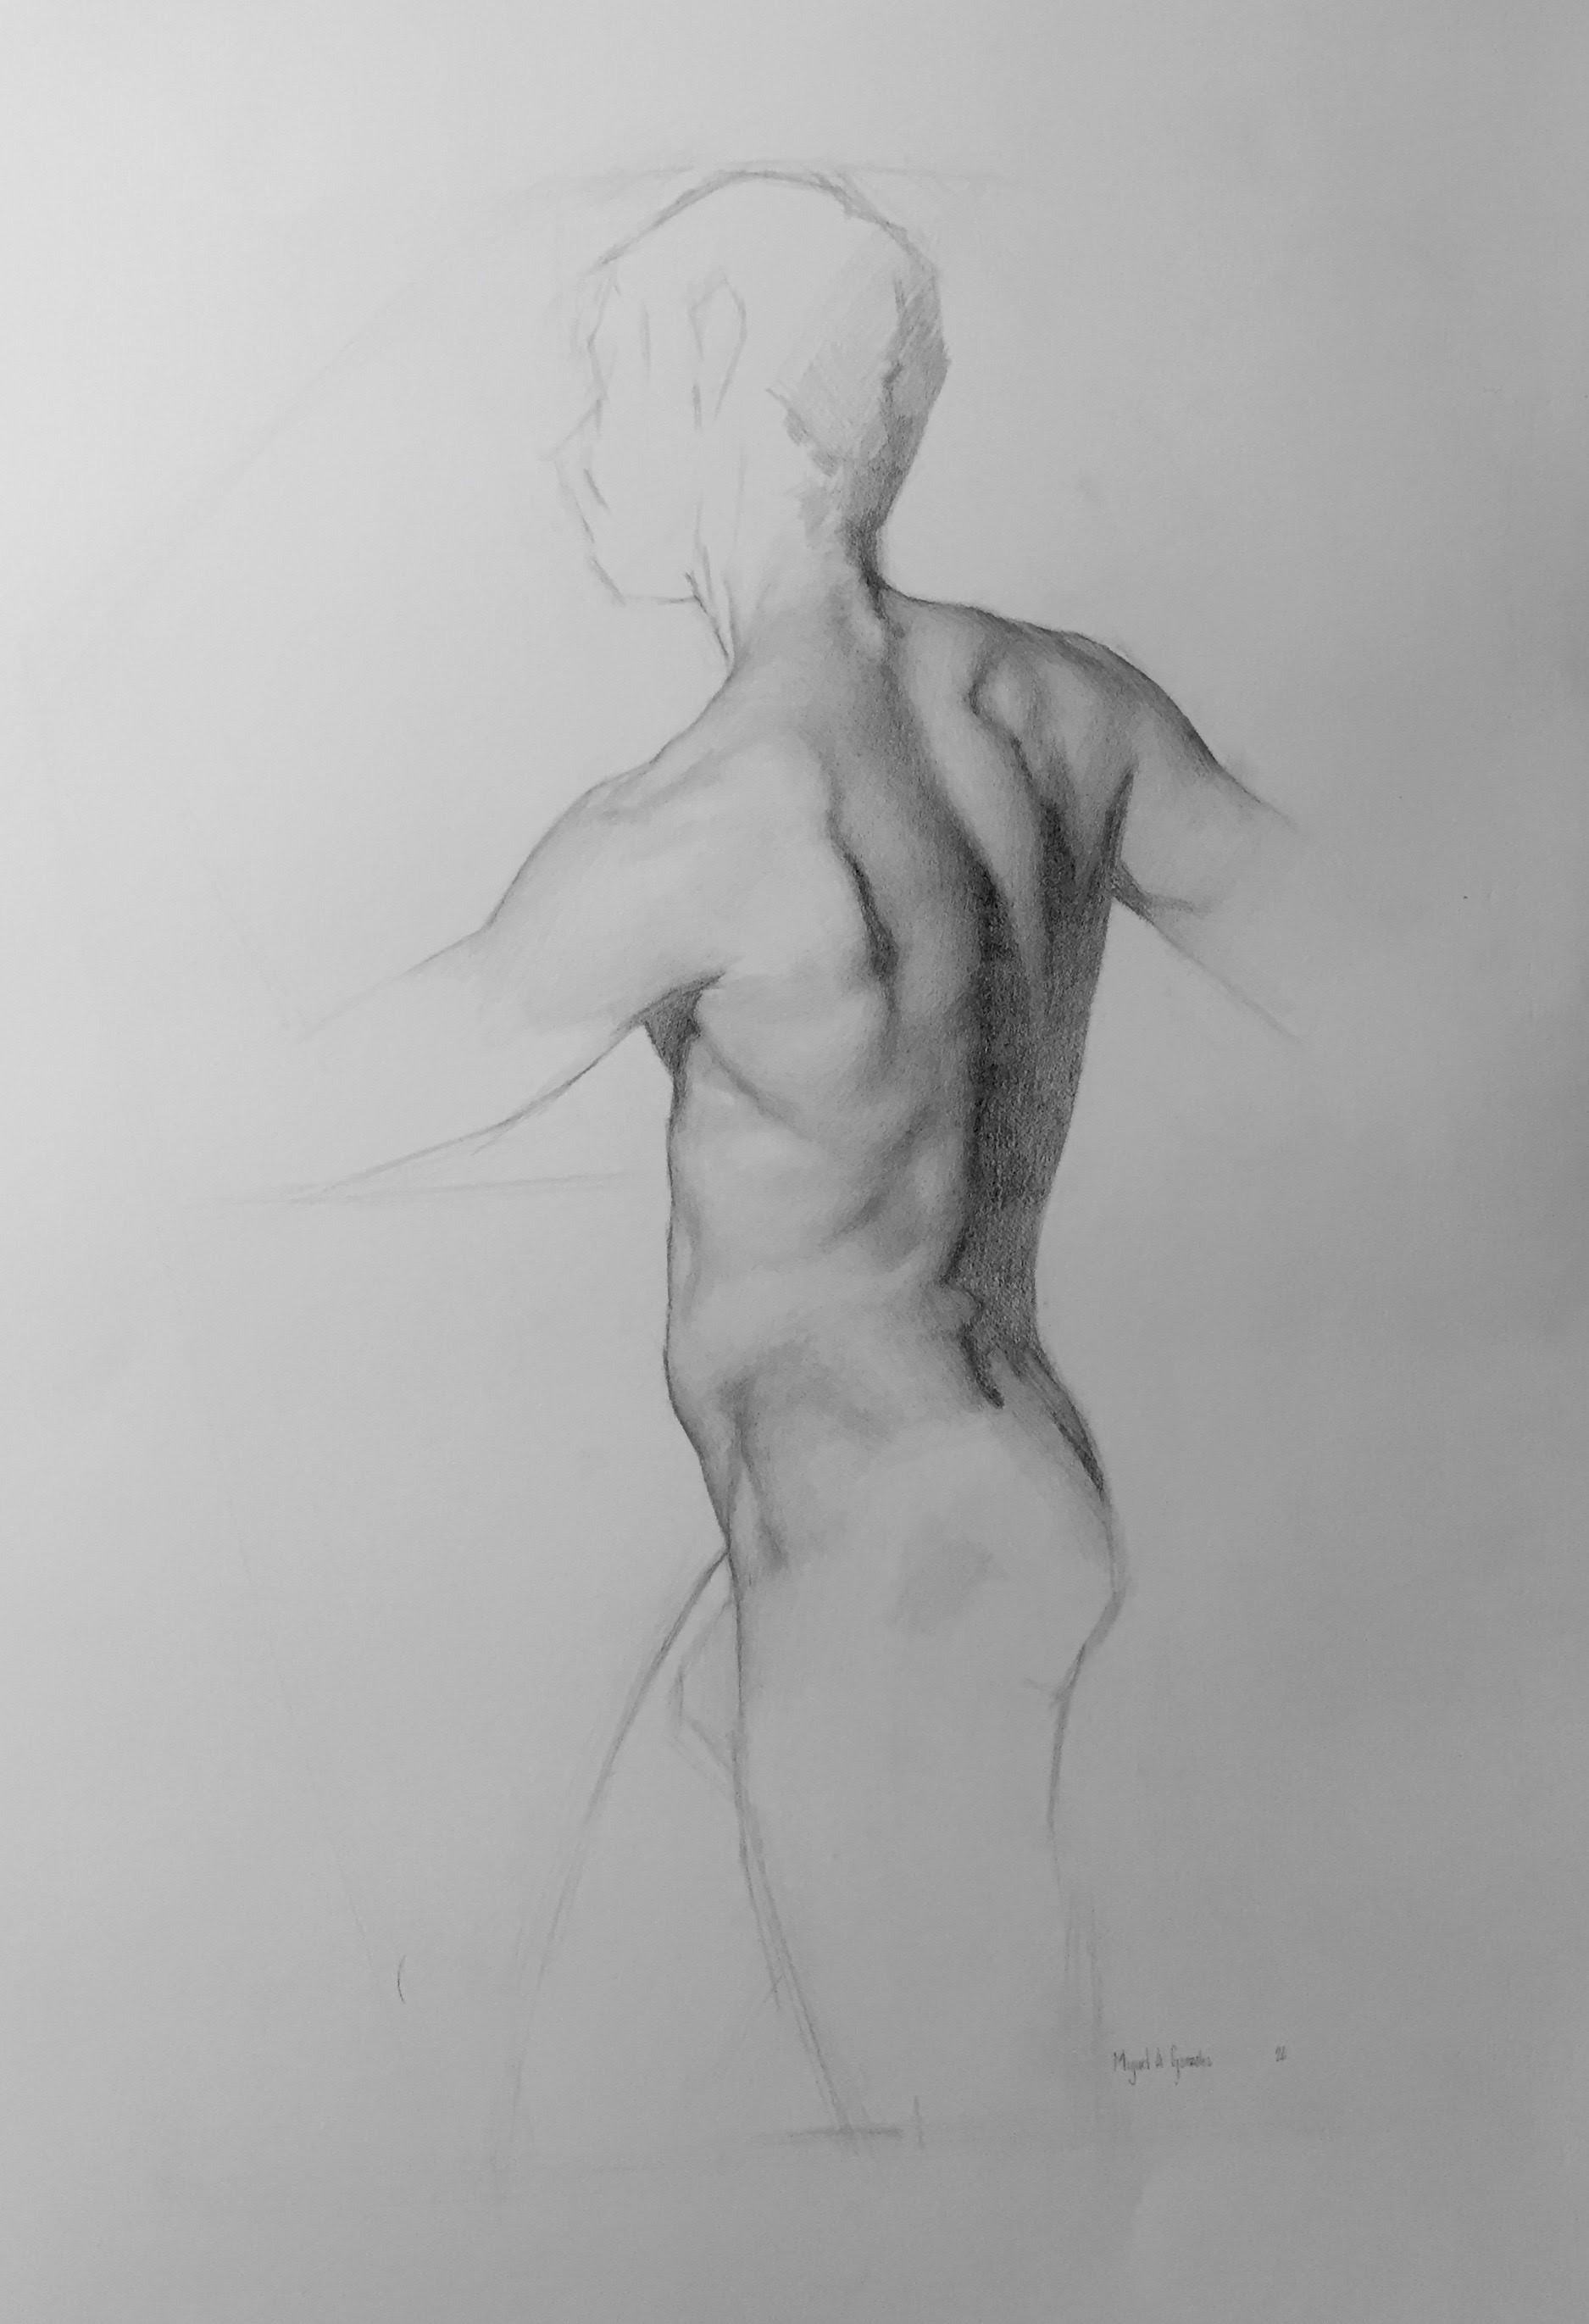 Beginning Figure Drawing at Kline Academy